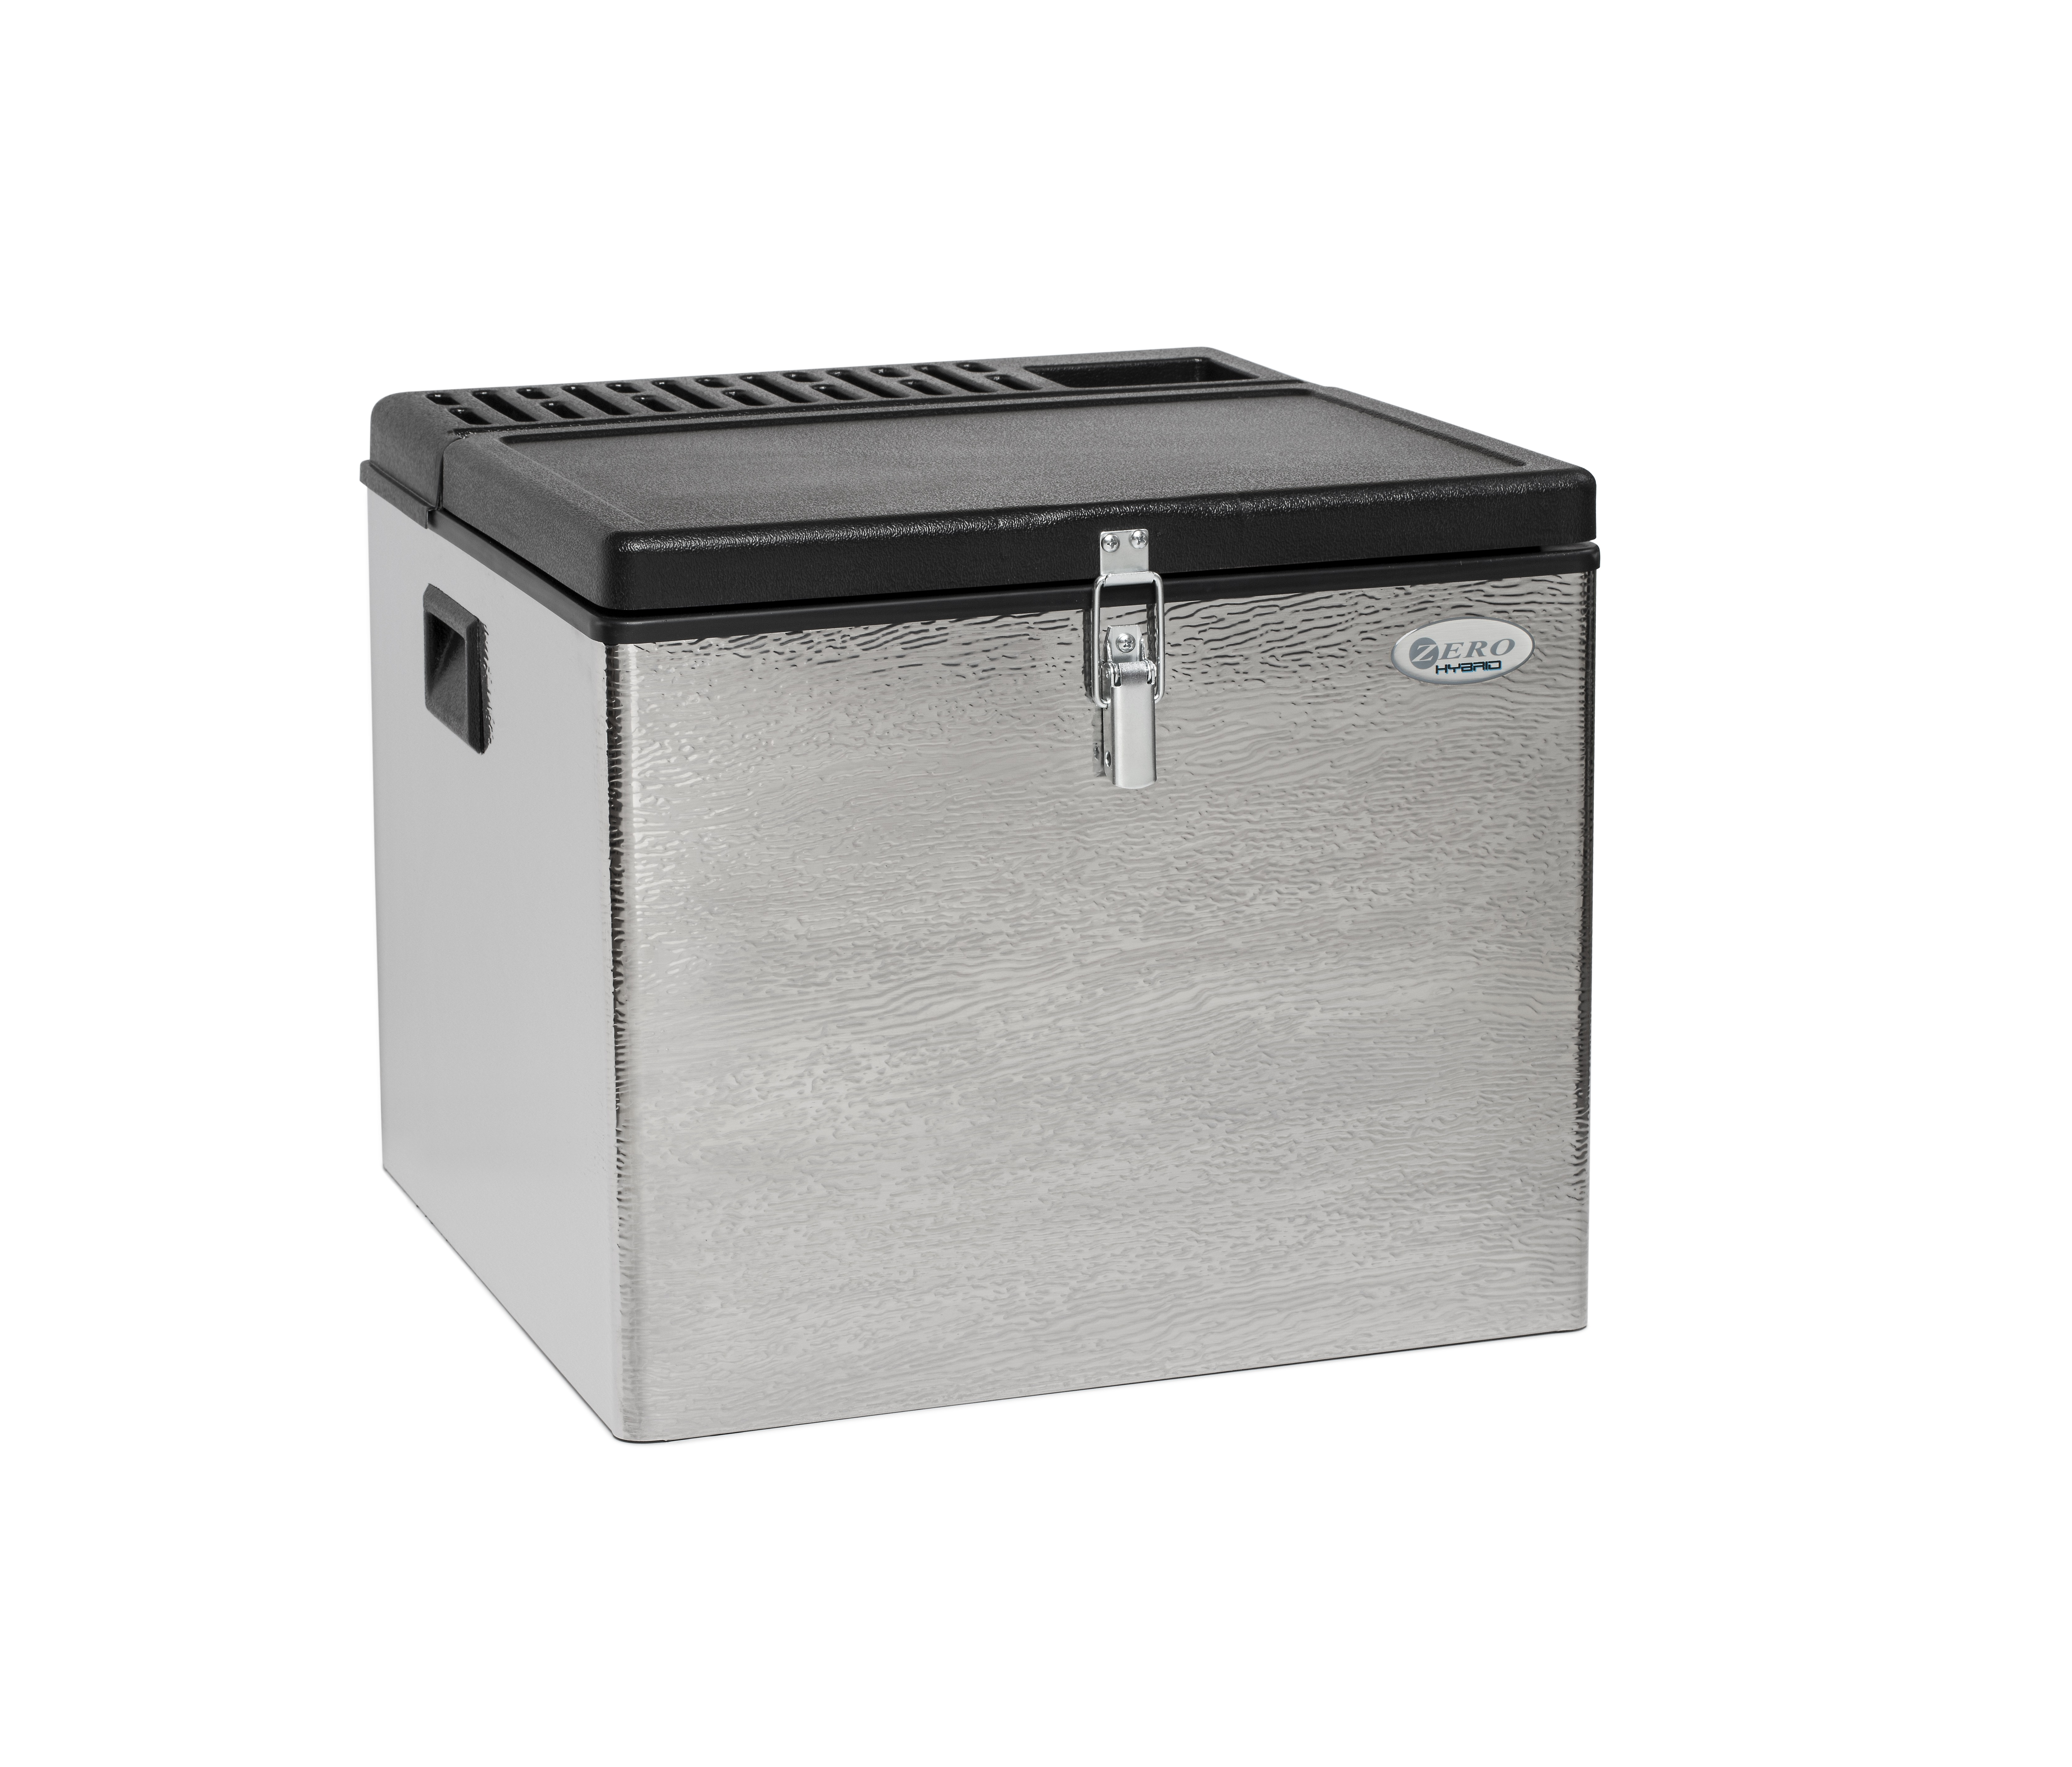 Zero Appliances RV35 12/220V Portable Chest Fridge or Freezer